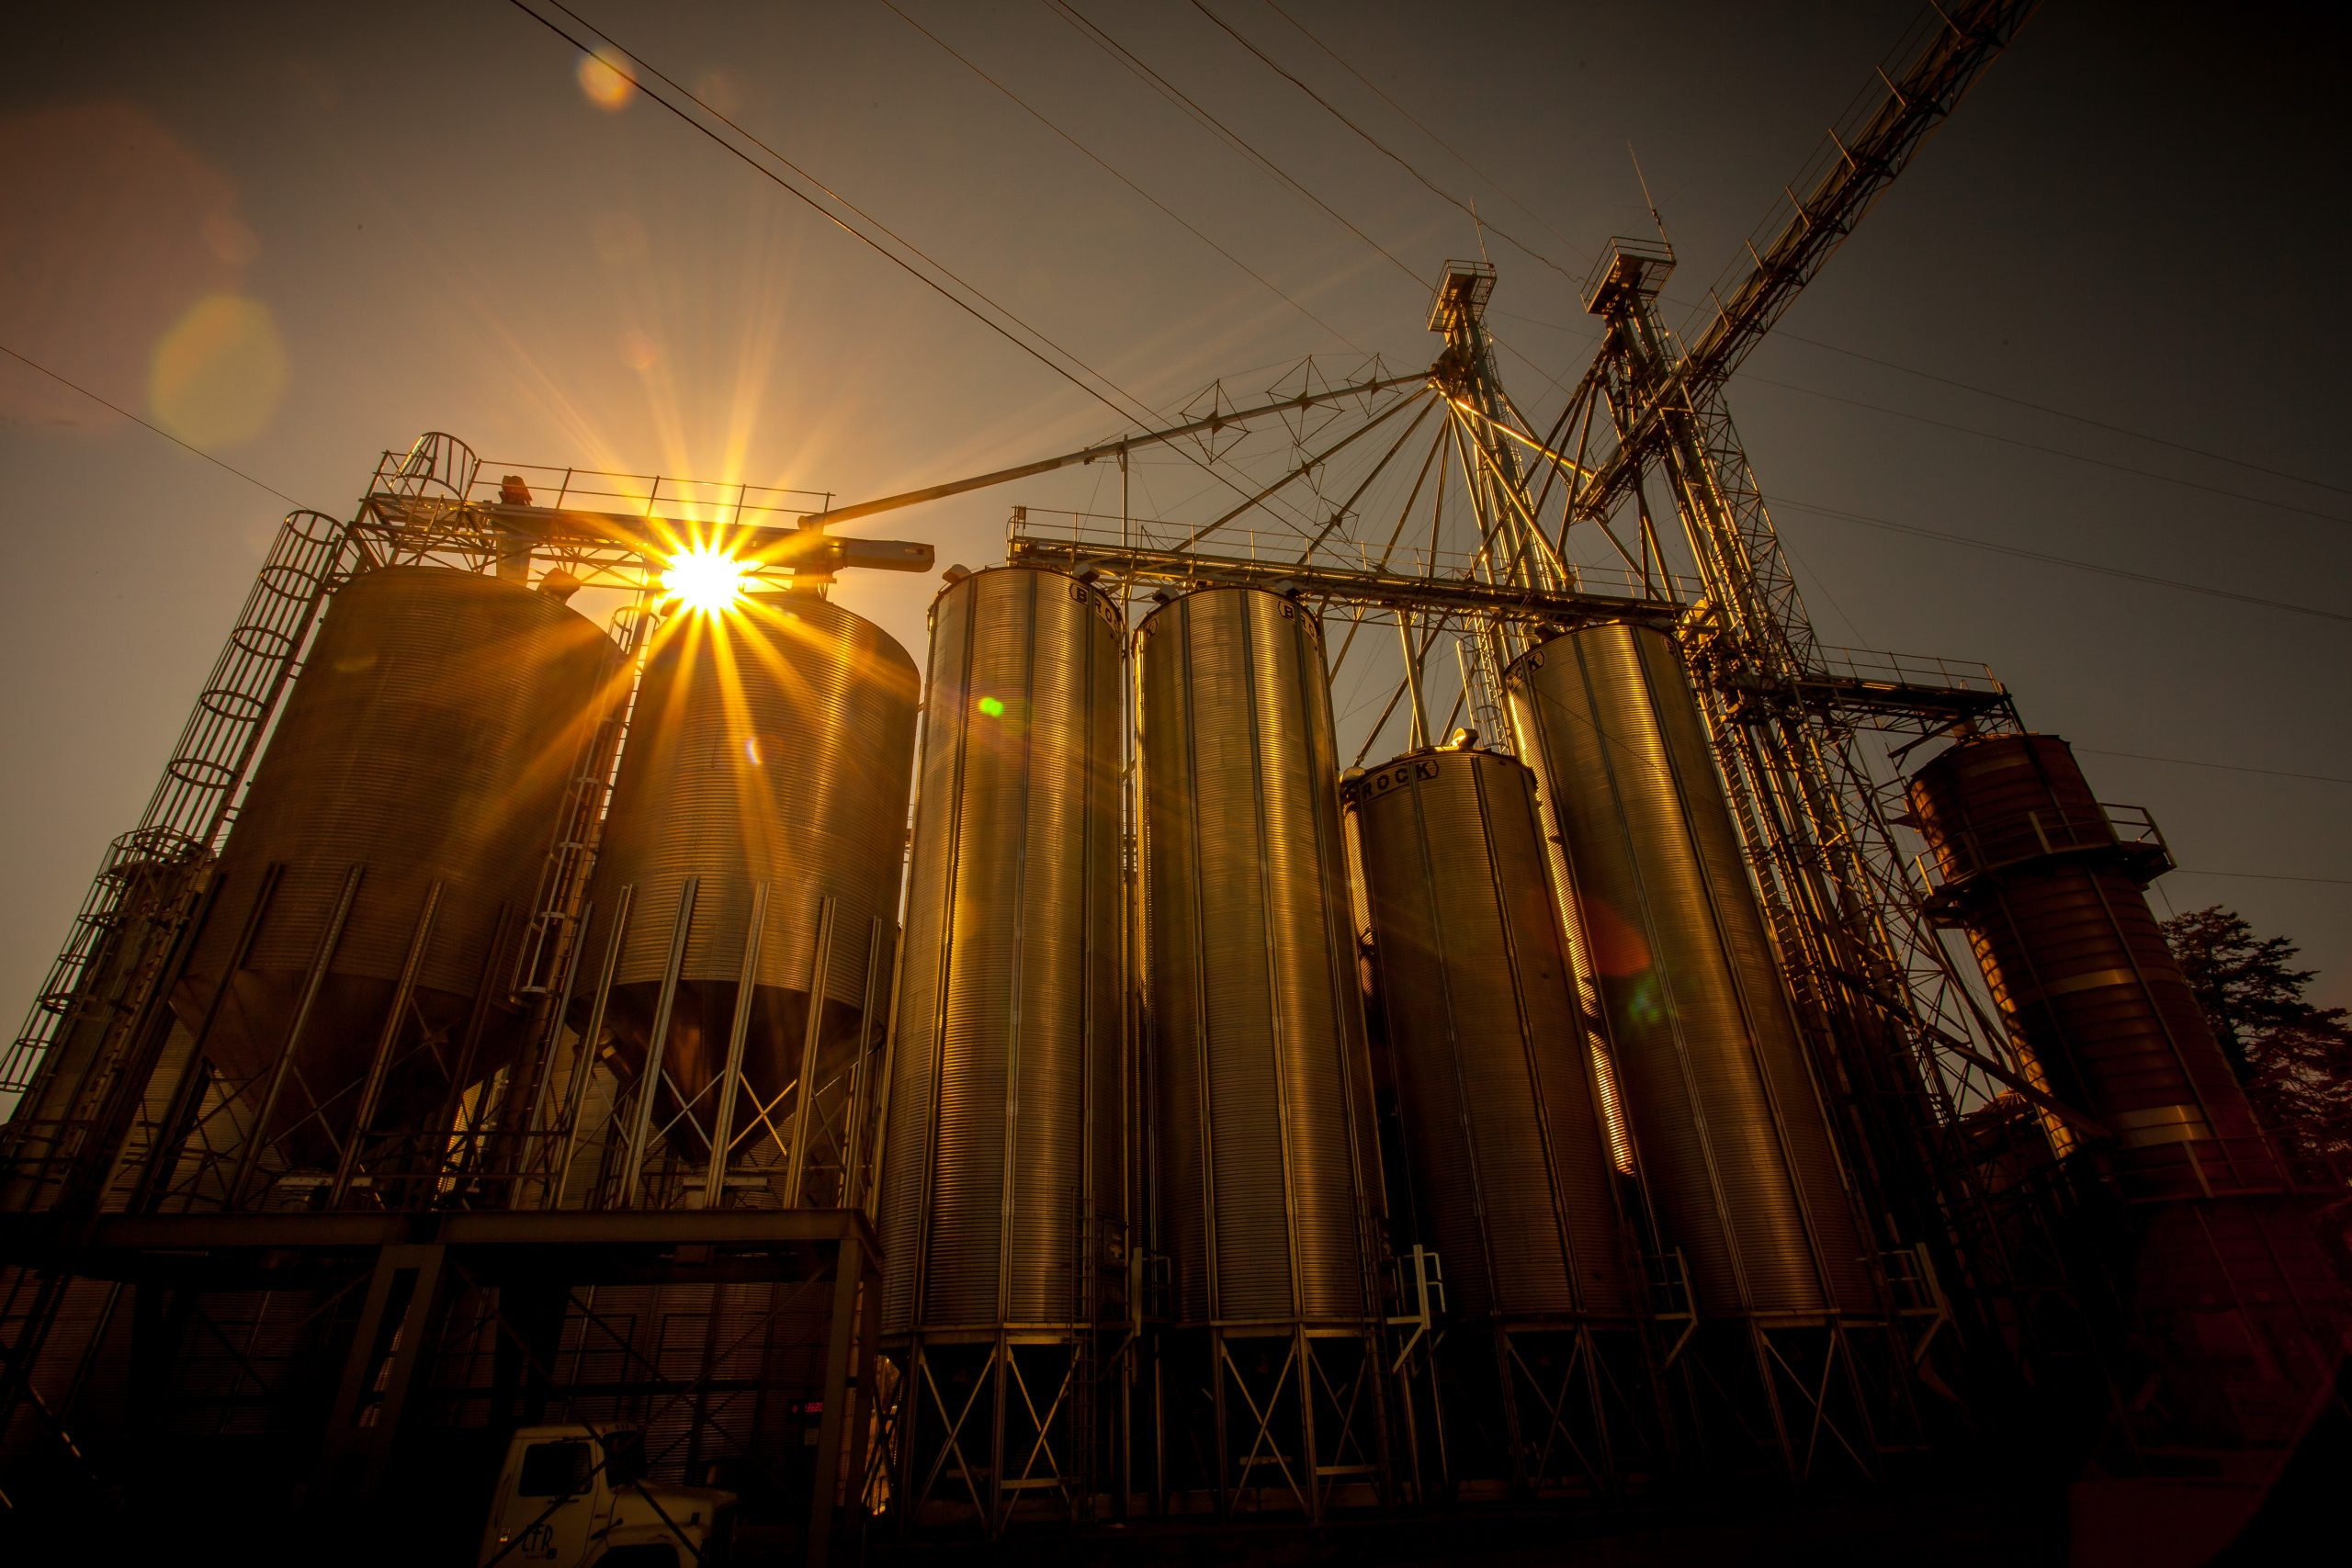 Gray metal industrial machine at golden hour